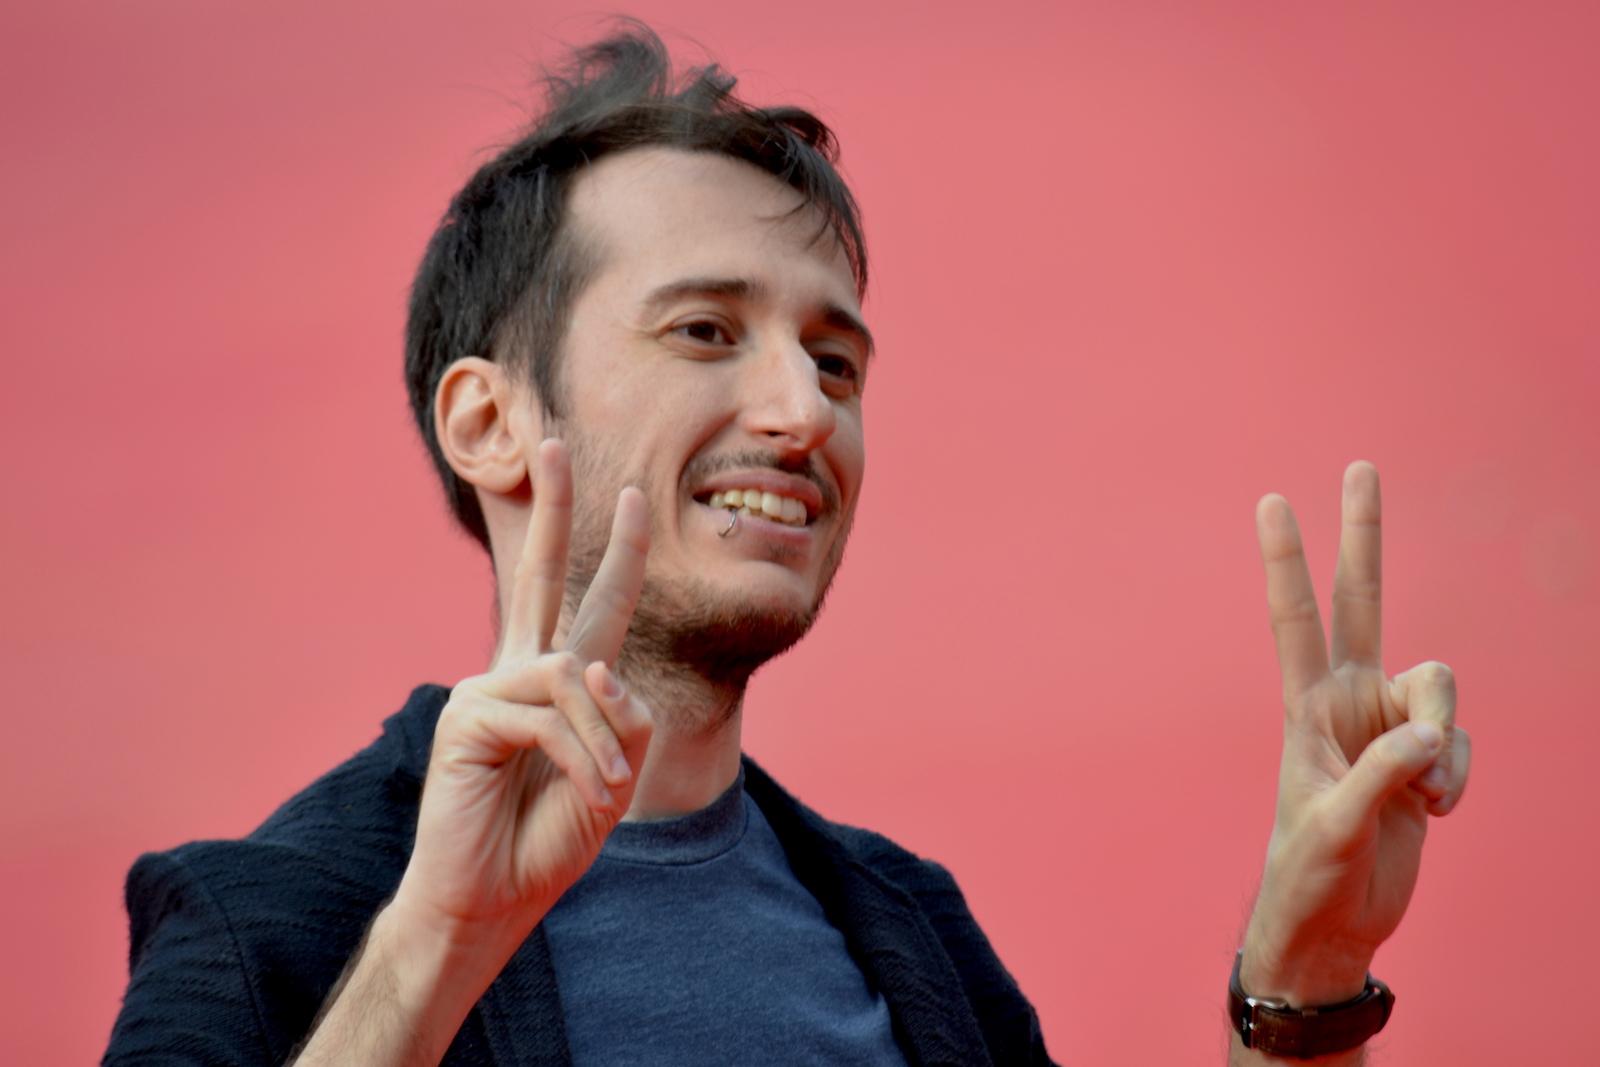 Roma 2015: Luca Denaro sorride ai fotografi sul red carpet di Inside Out